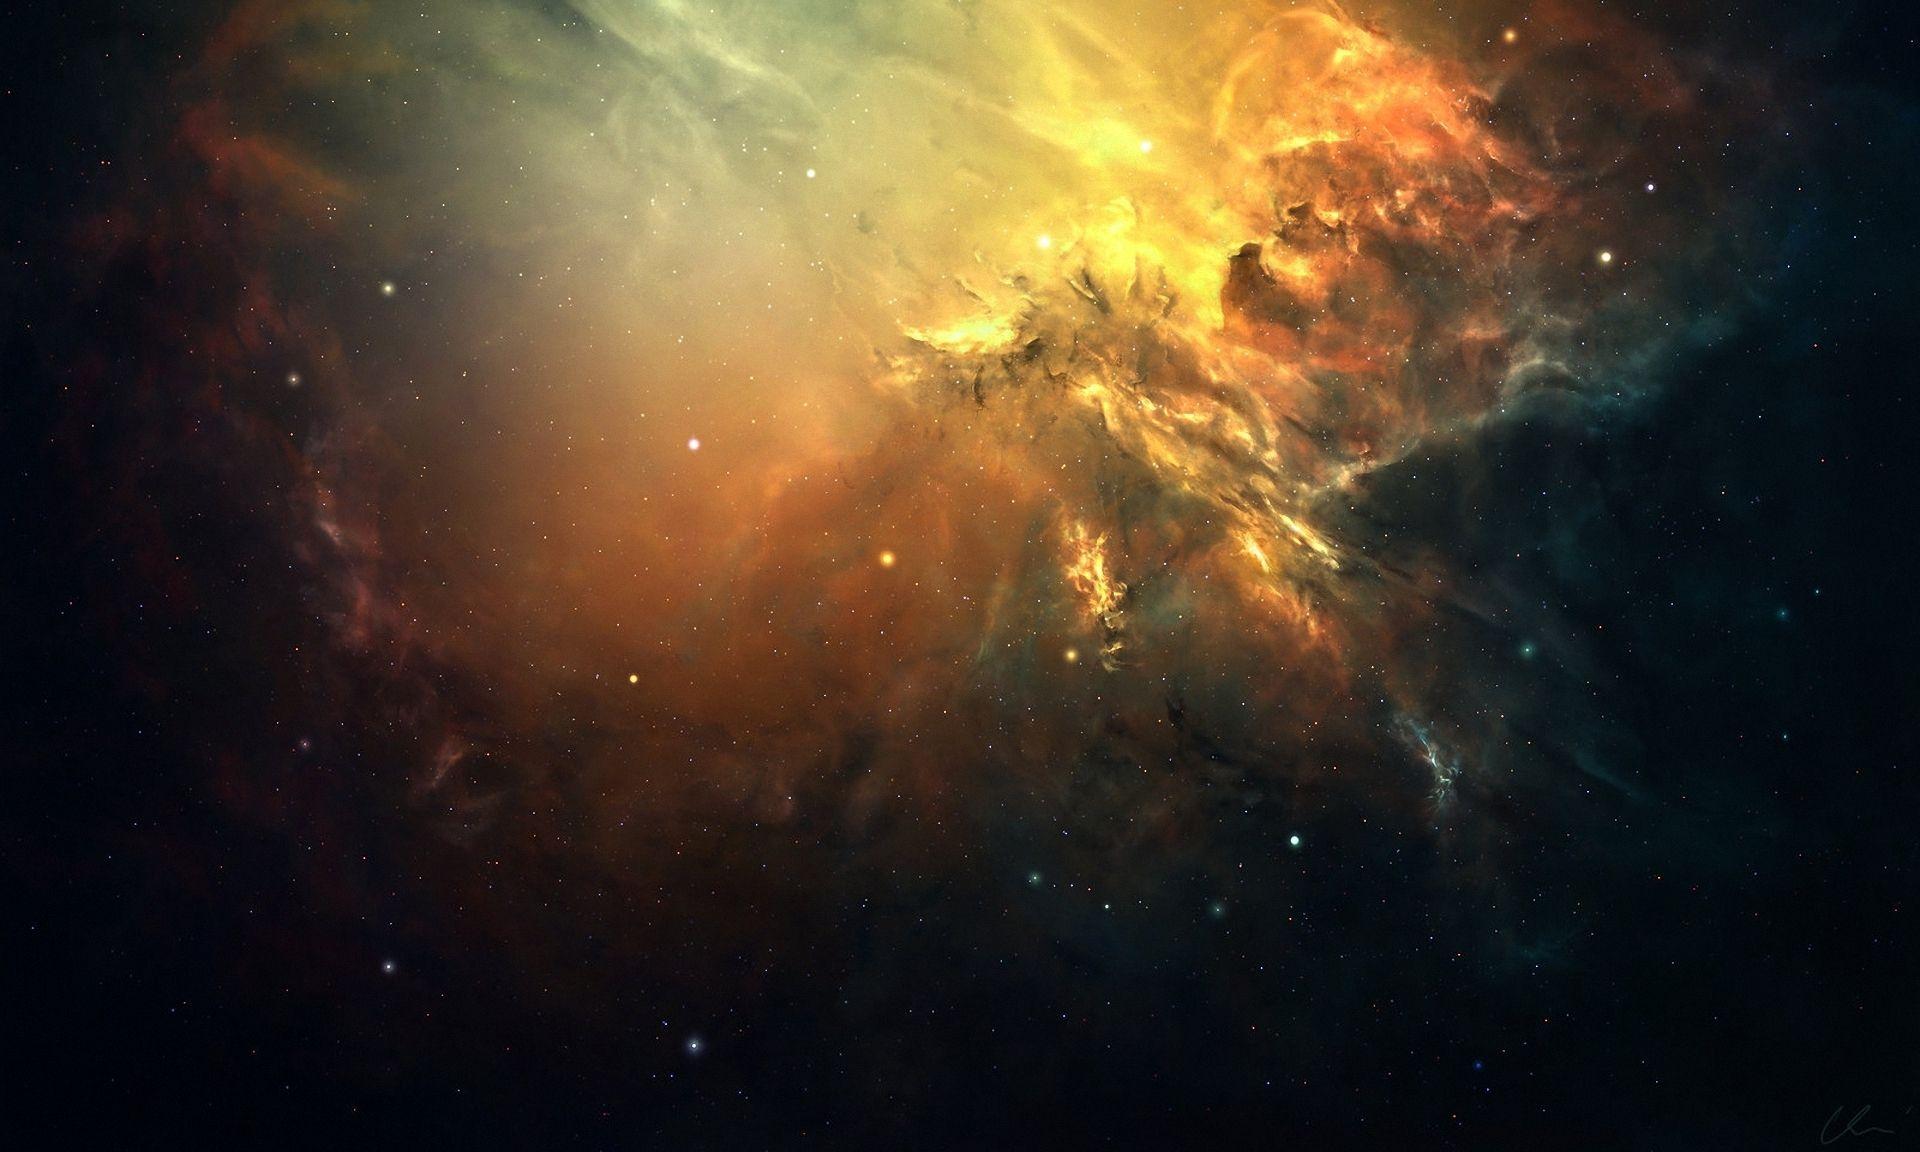 Fond D Ecran Hd Espace Science Fiction 4 Nebula Wallpaper Nebula Galaxy Wallpaper